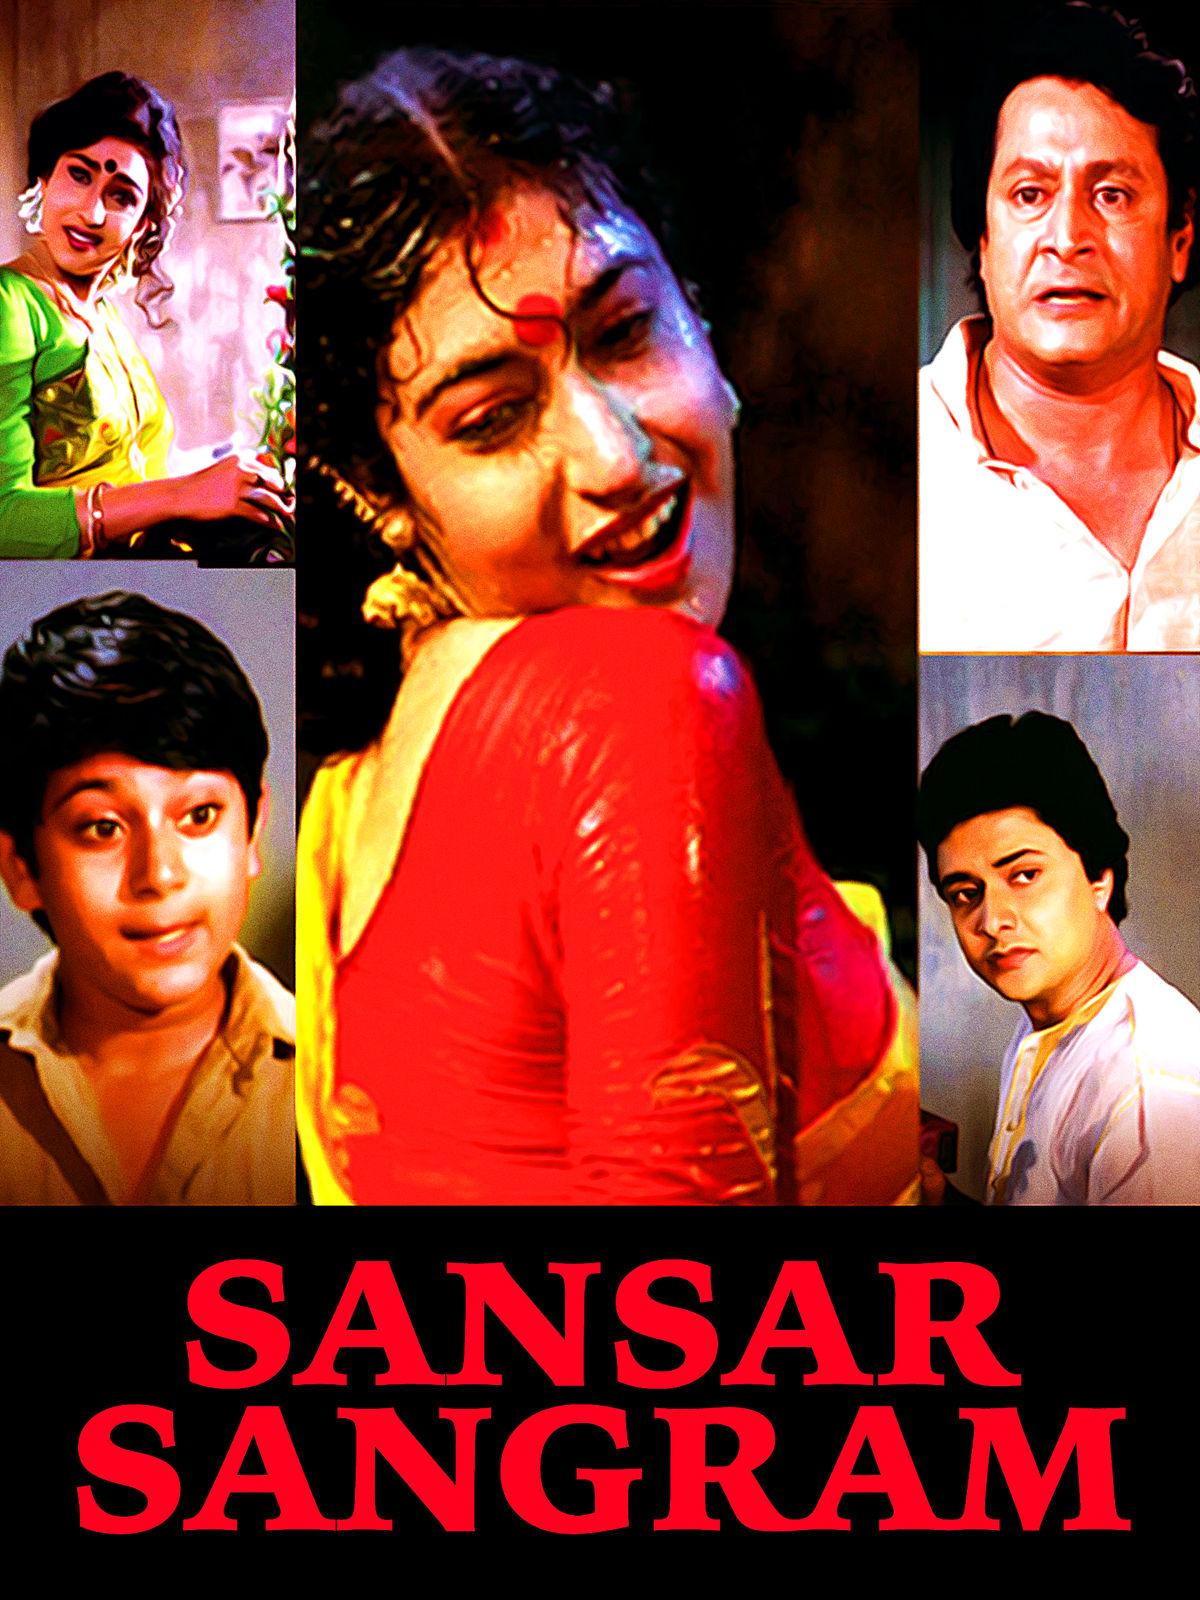 Sansaar Sangram